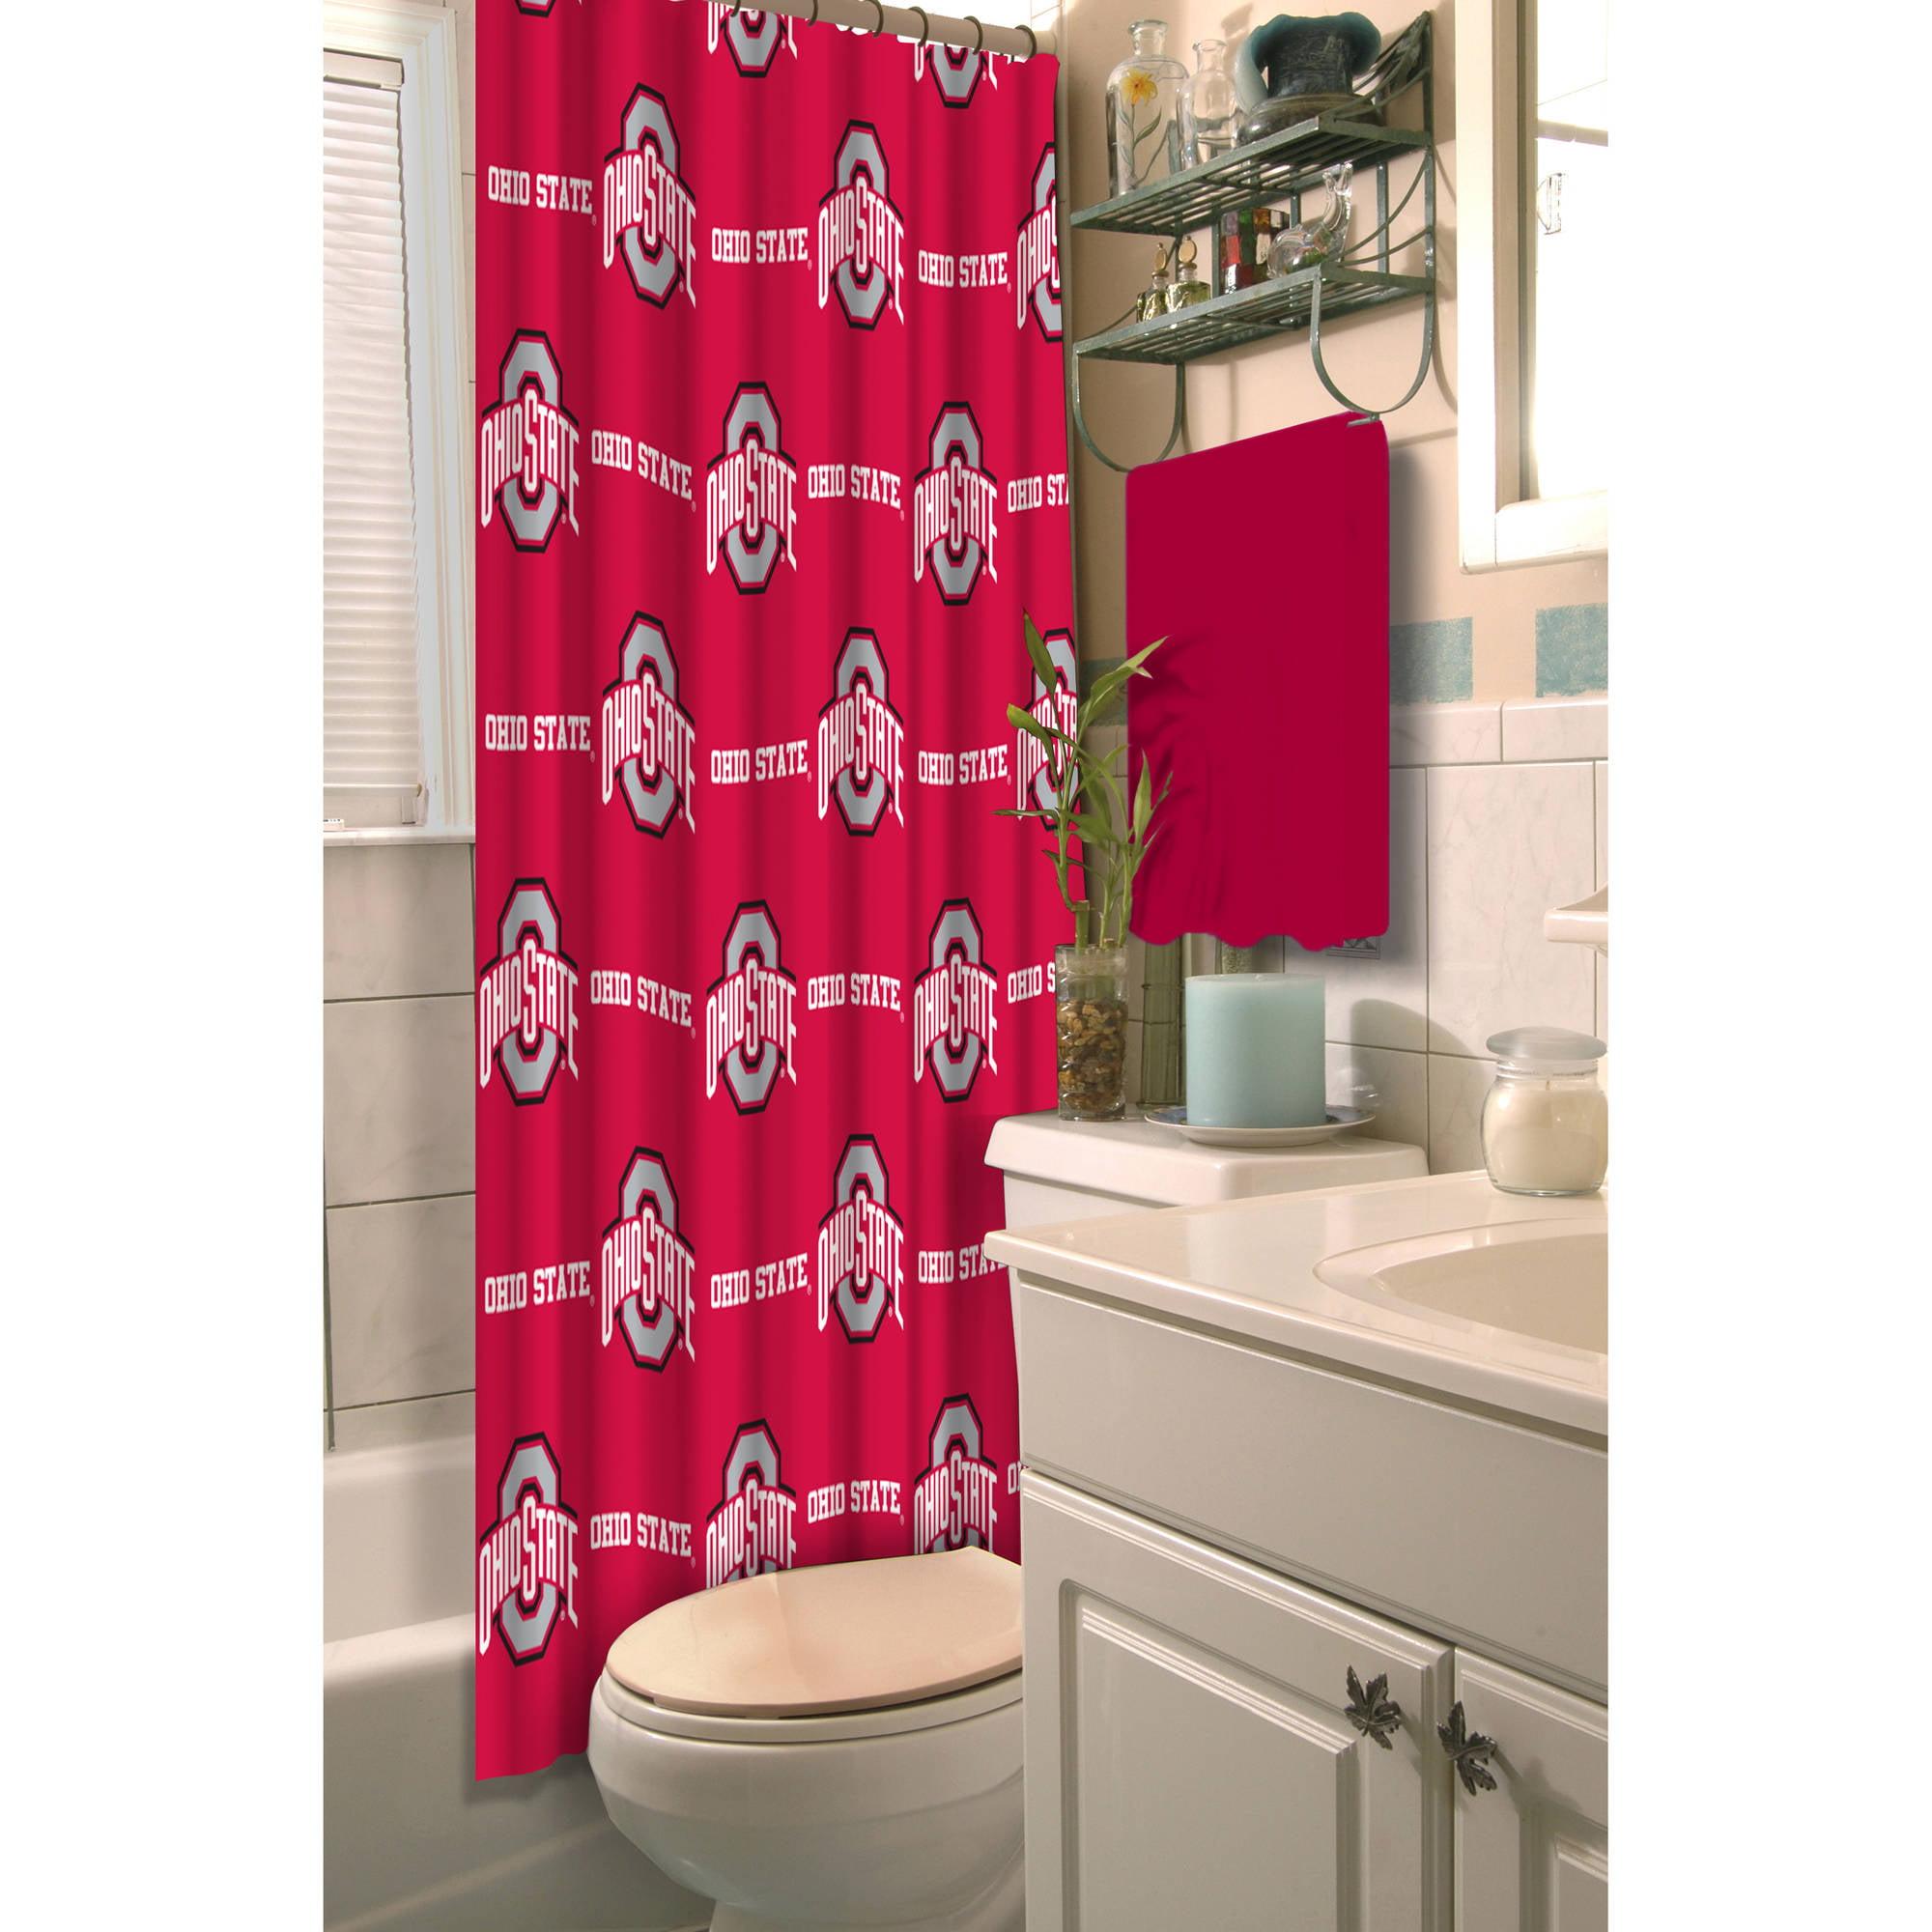 Ohio State Bedroom Decor Ncaa Ohio State University Decorative Bath Collection Shower